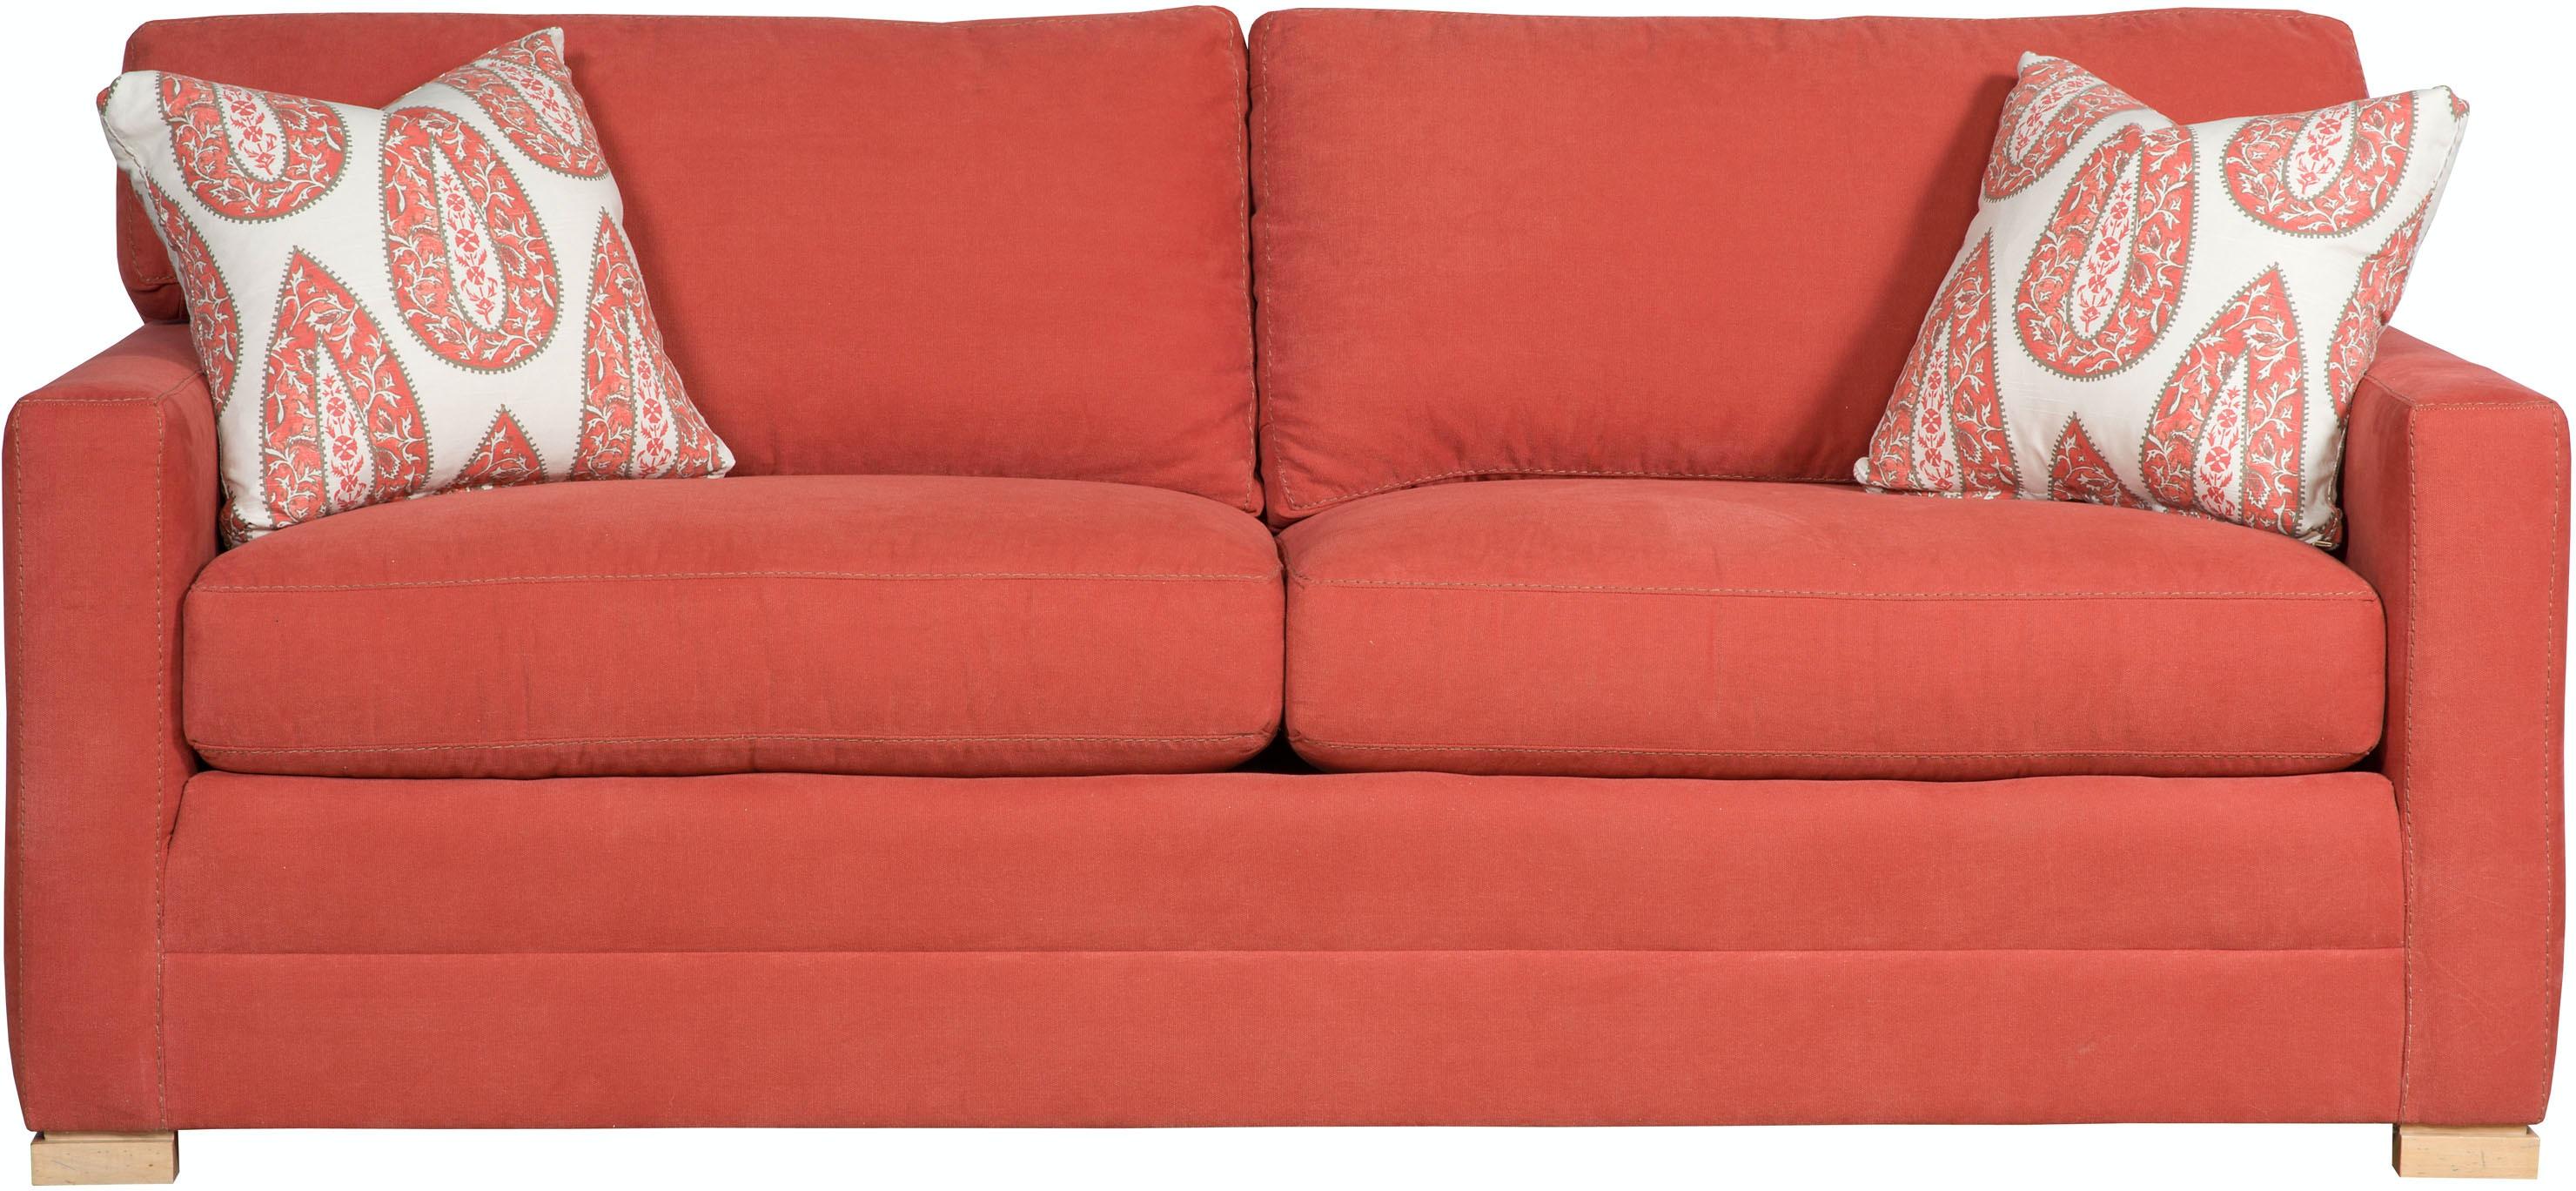 Vanguard Furniture 600 2S Living Room Hillcrest Sofa